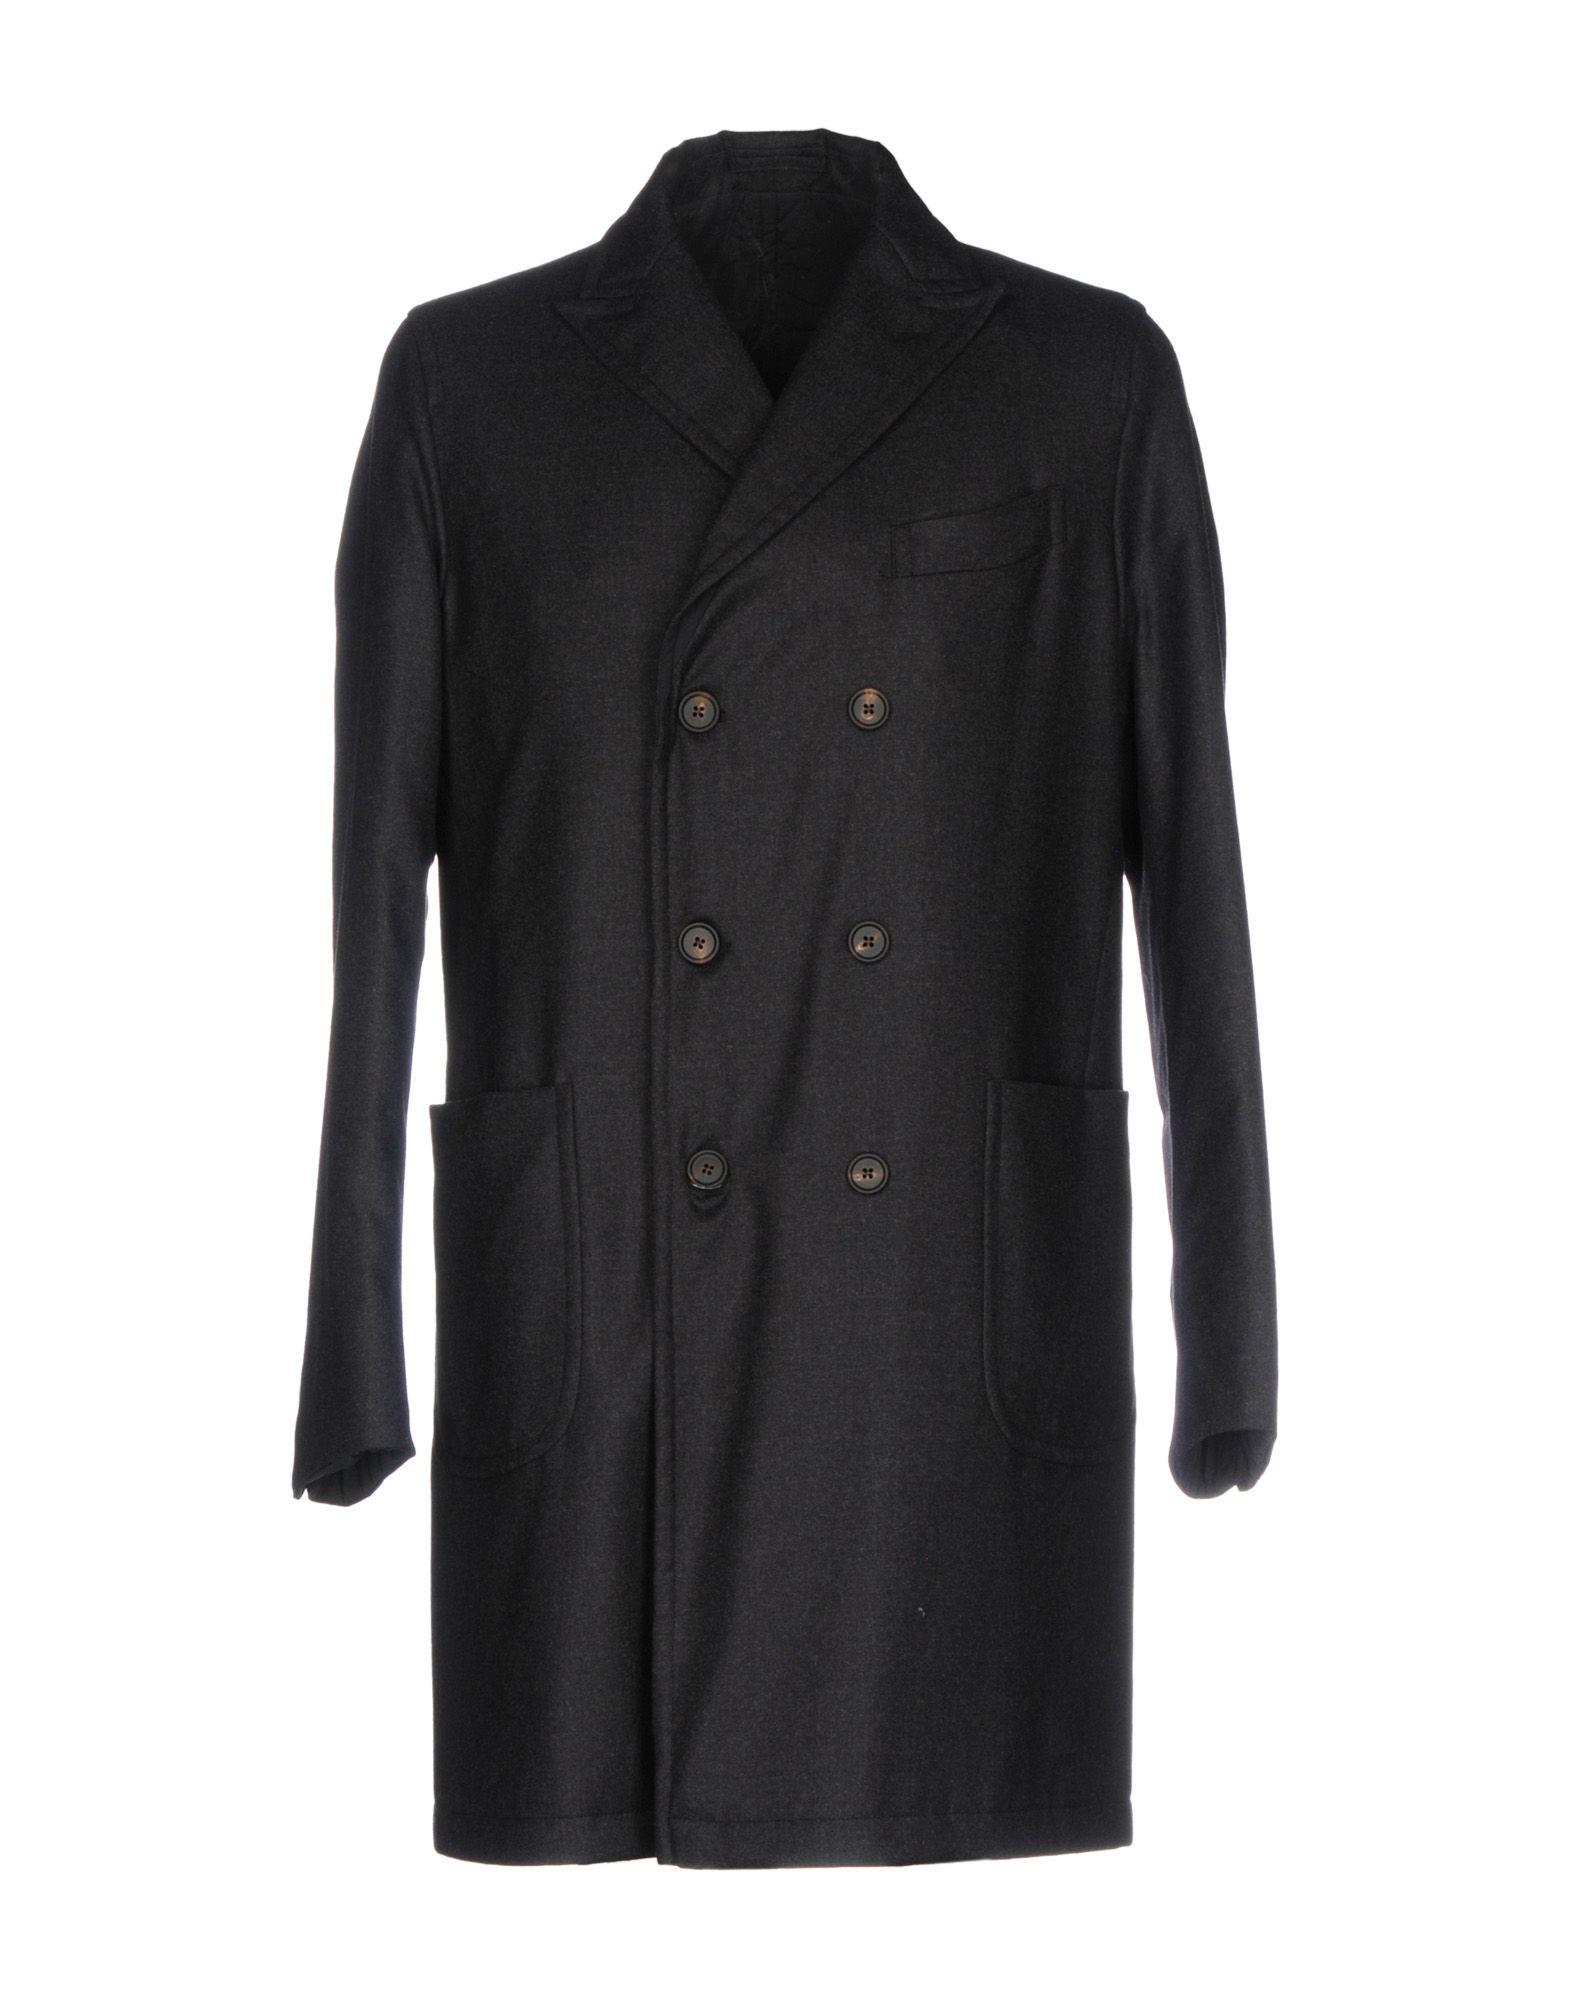 Rvr Lardini Coats In Steel Grey